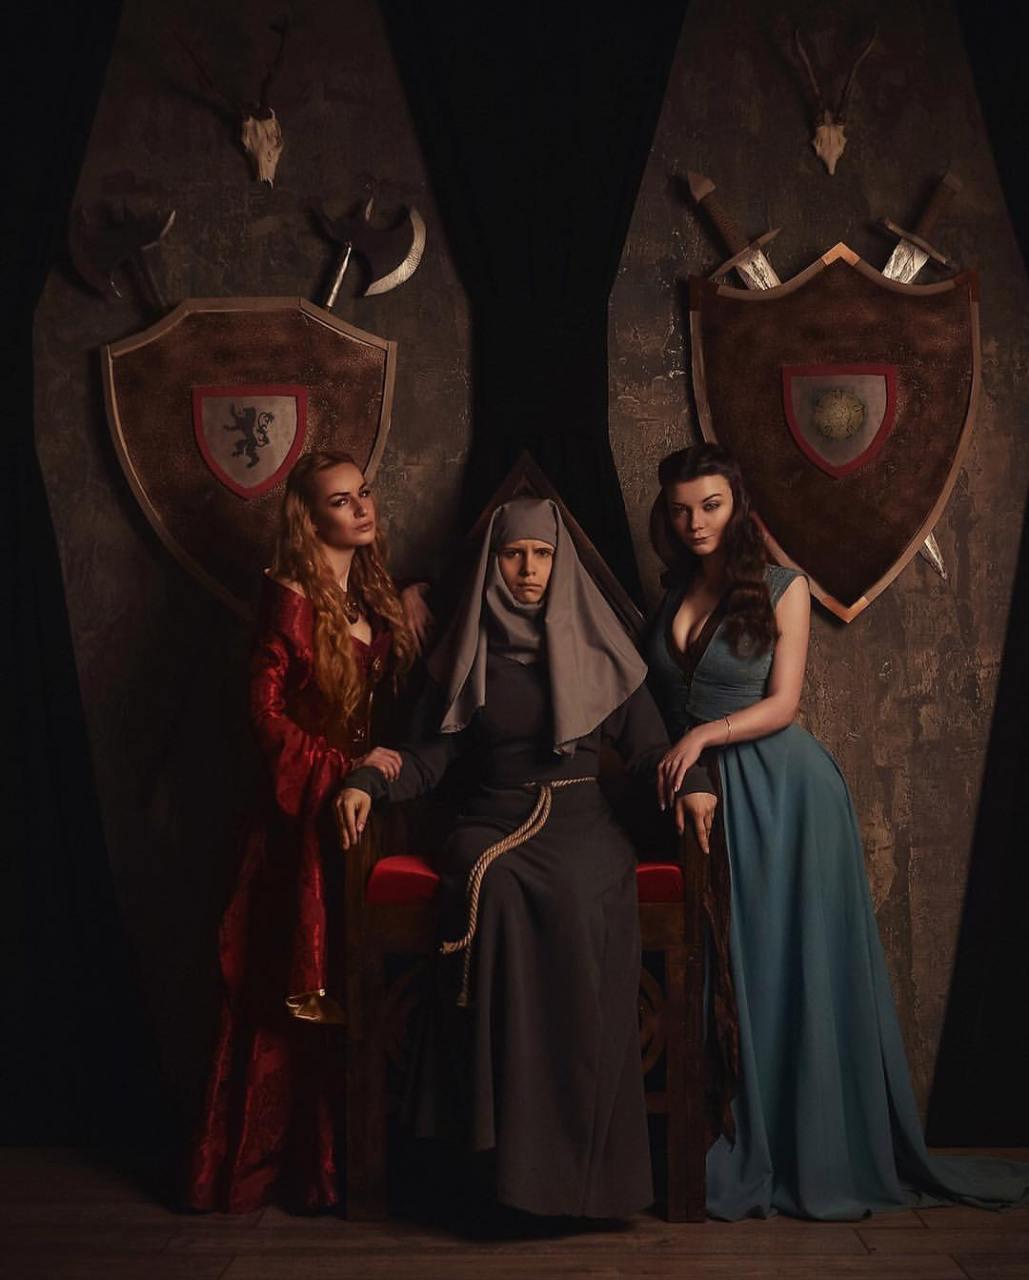 Game of Thrones - Cosplays de Cersei, Septã Unella e Margaery